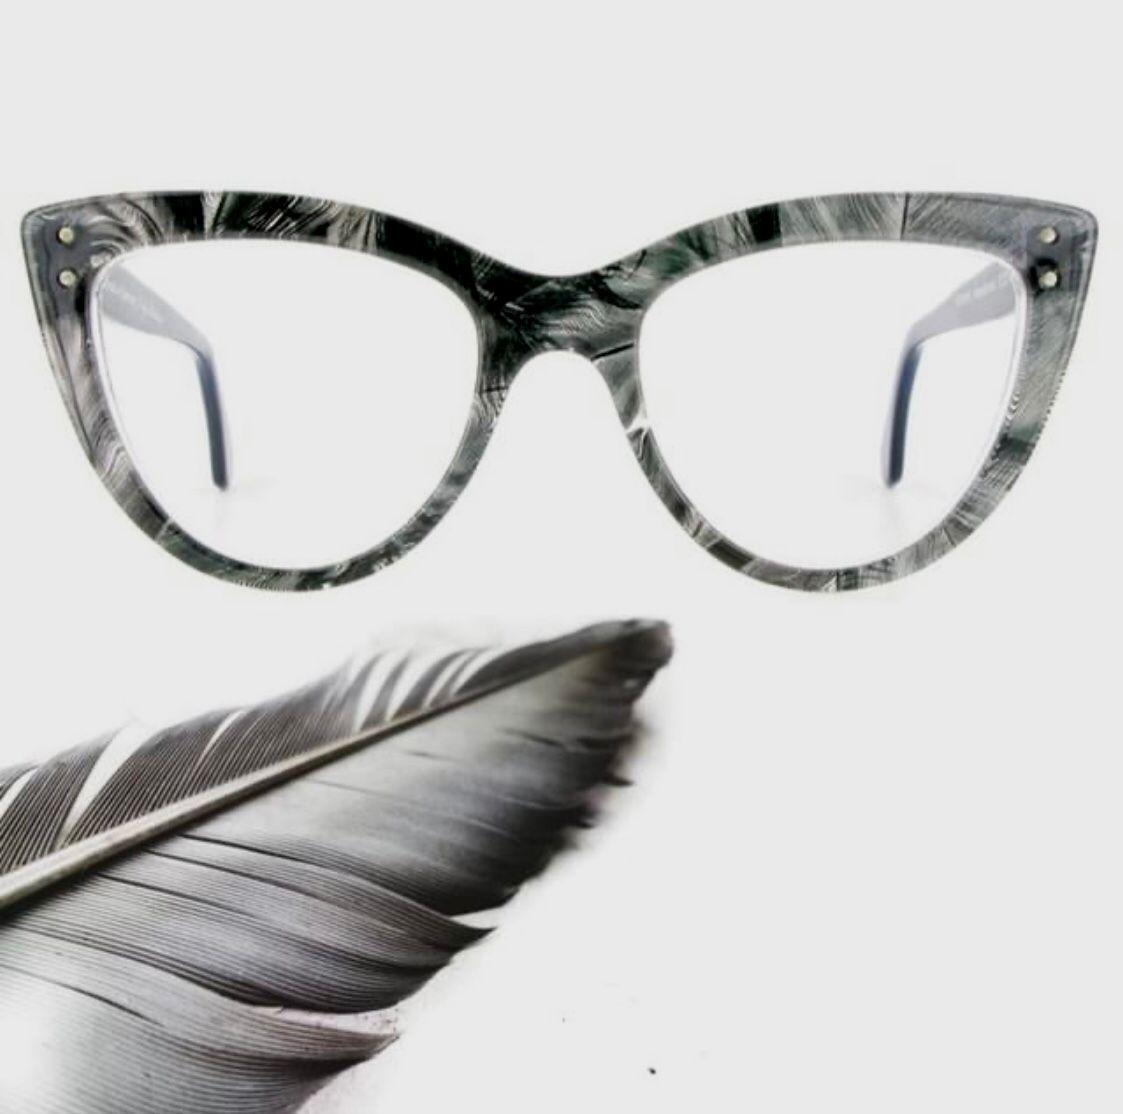 Schure - Ihr Augenoptiker